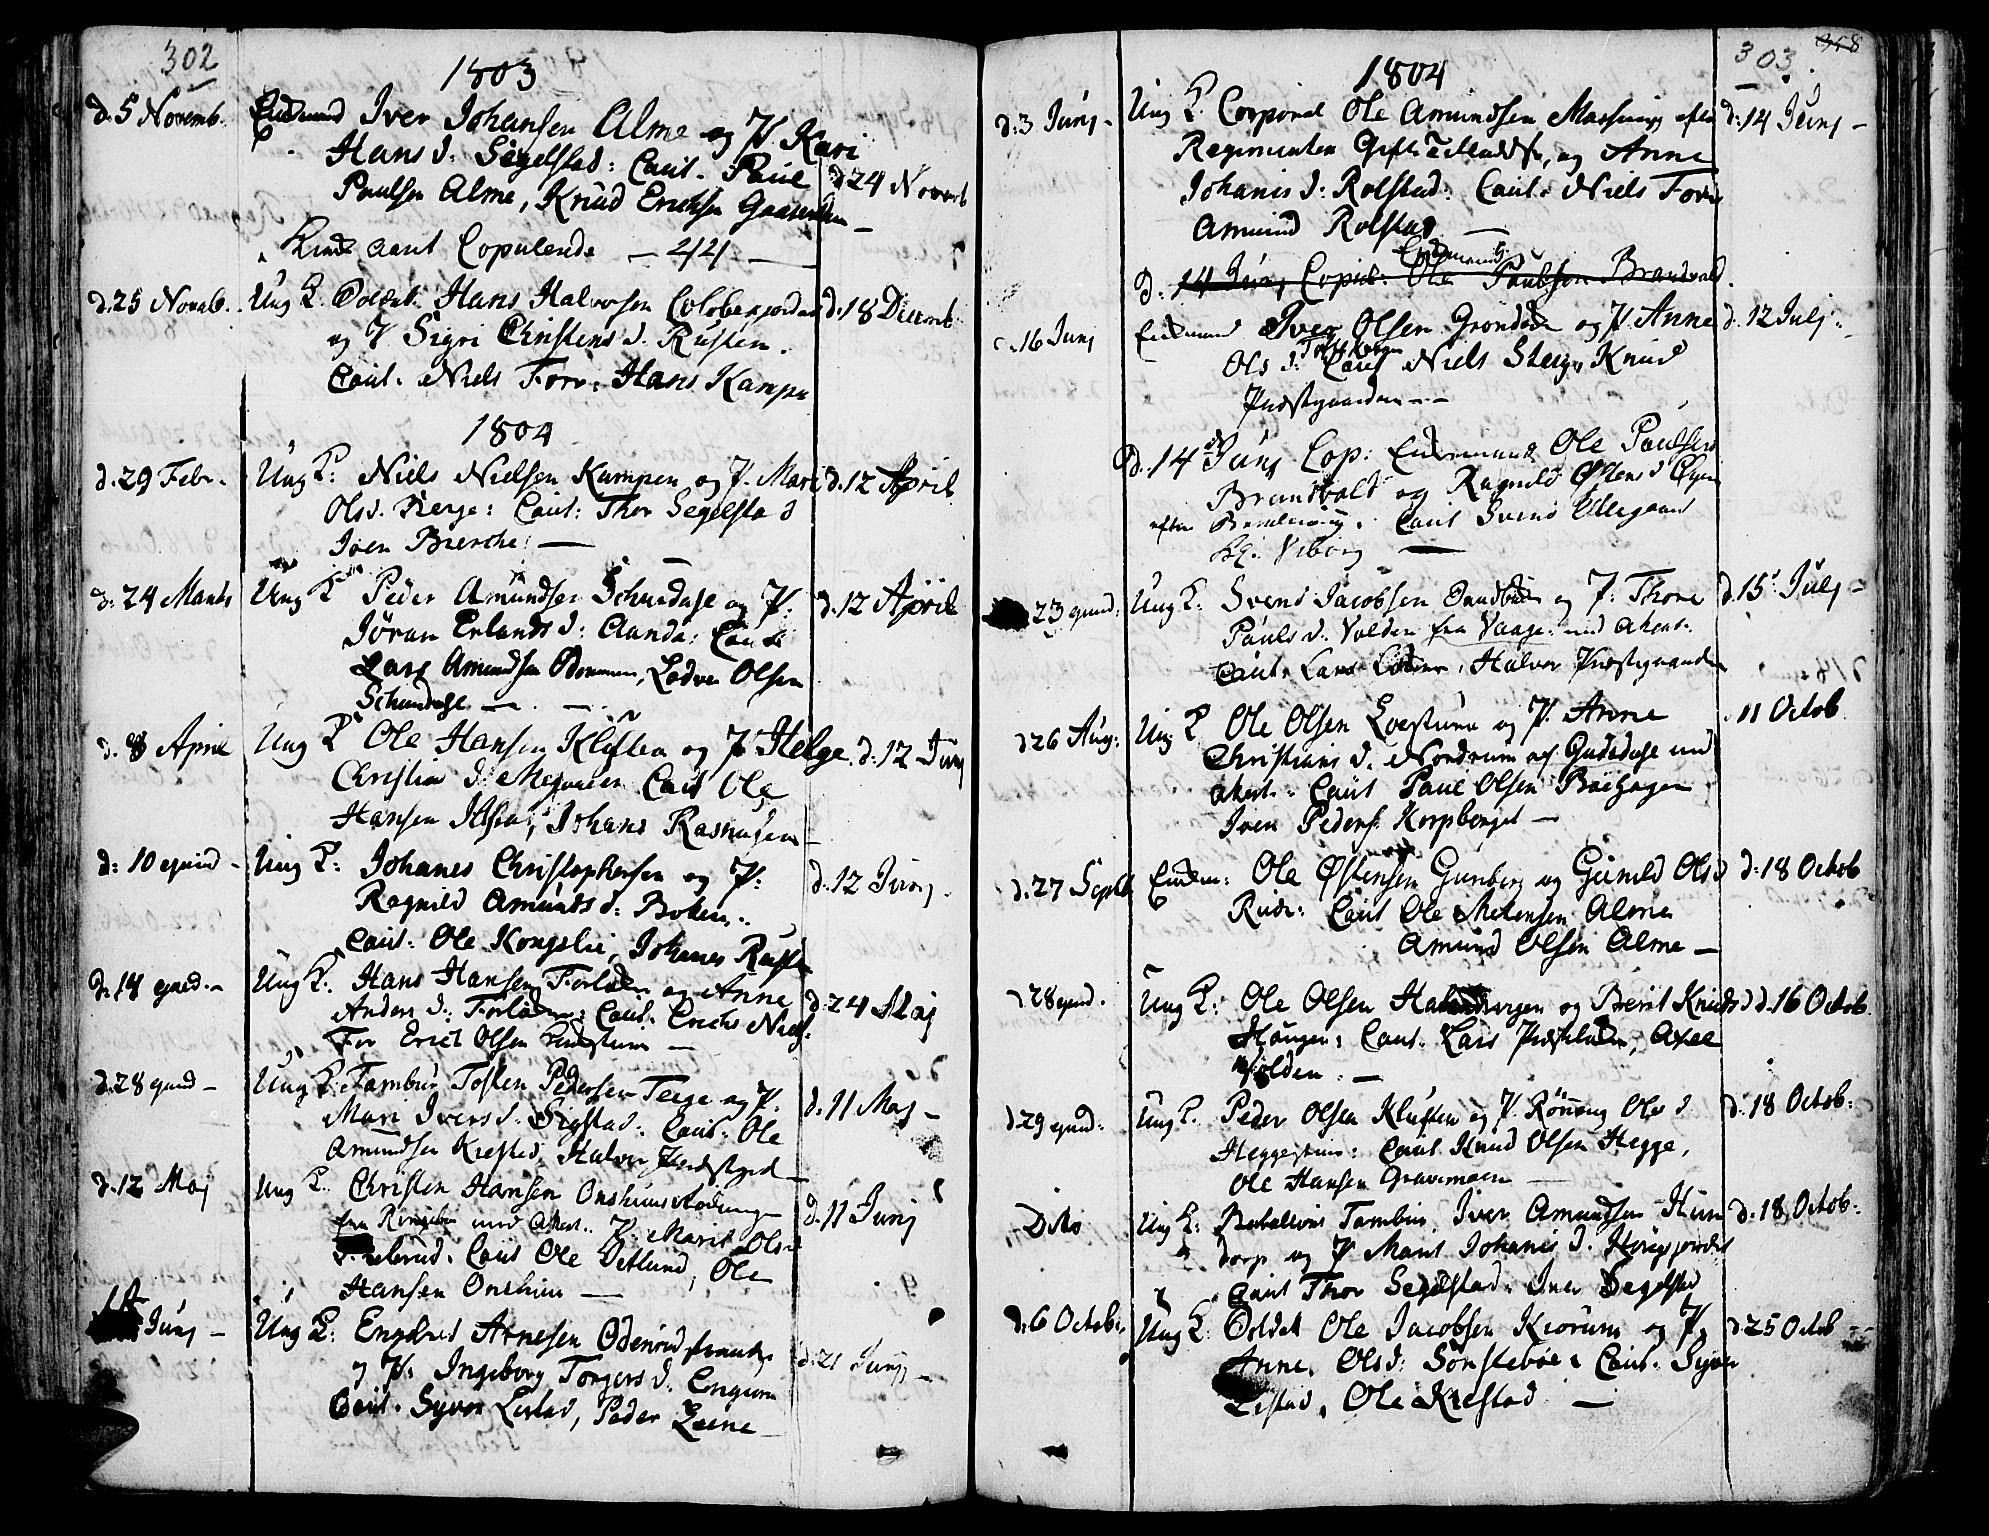 SAH, Fron prestekontor, H/Ha/Haa/L0001: Ministerialbok nr. 1, 1799-1816, s. 302-303